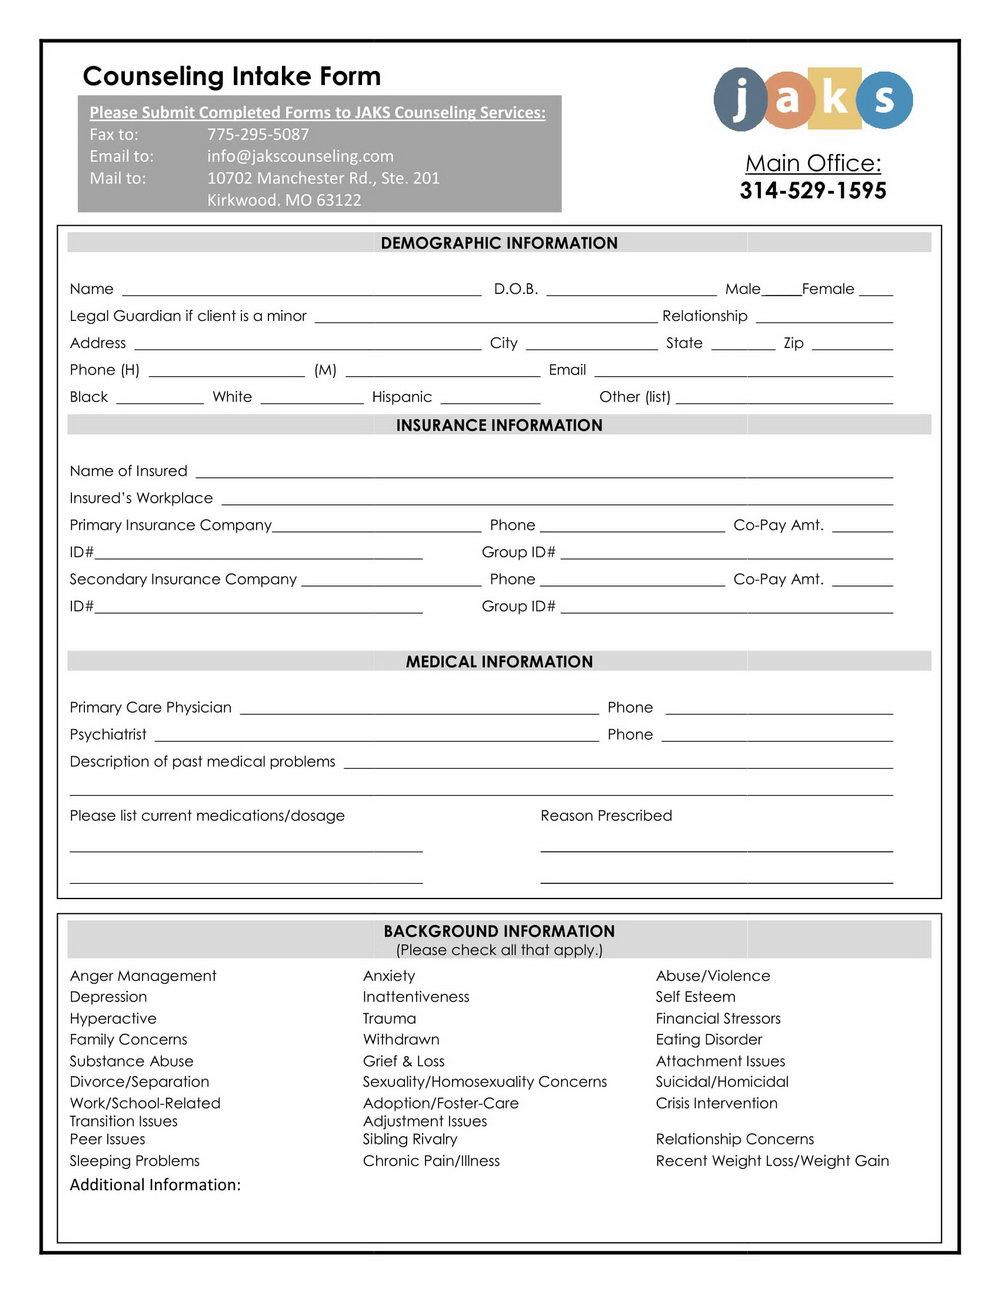 Sample Counseling Intake Forms